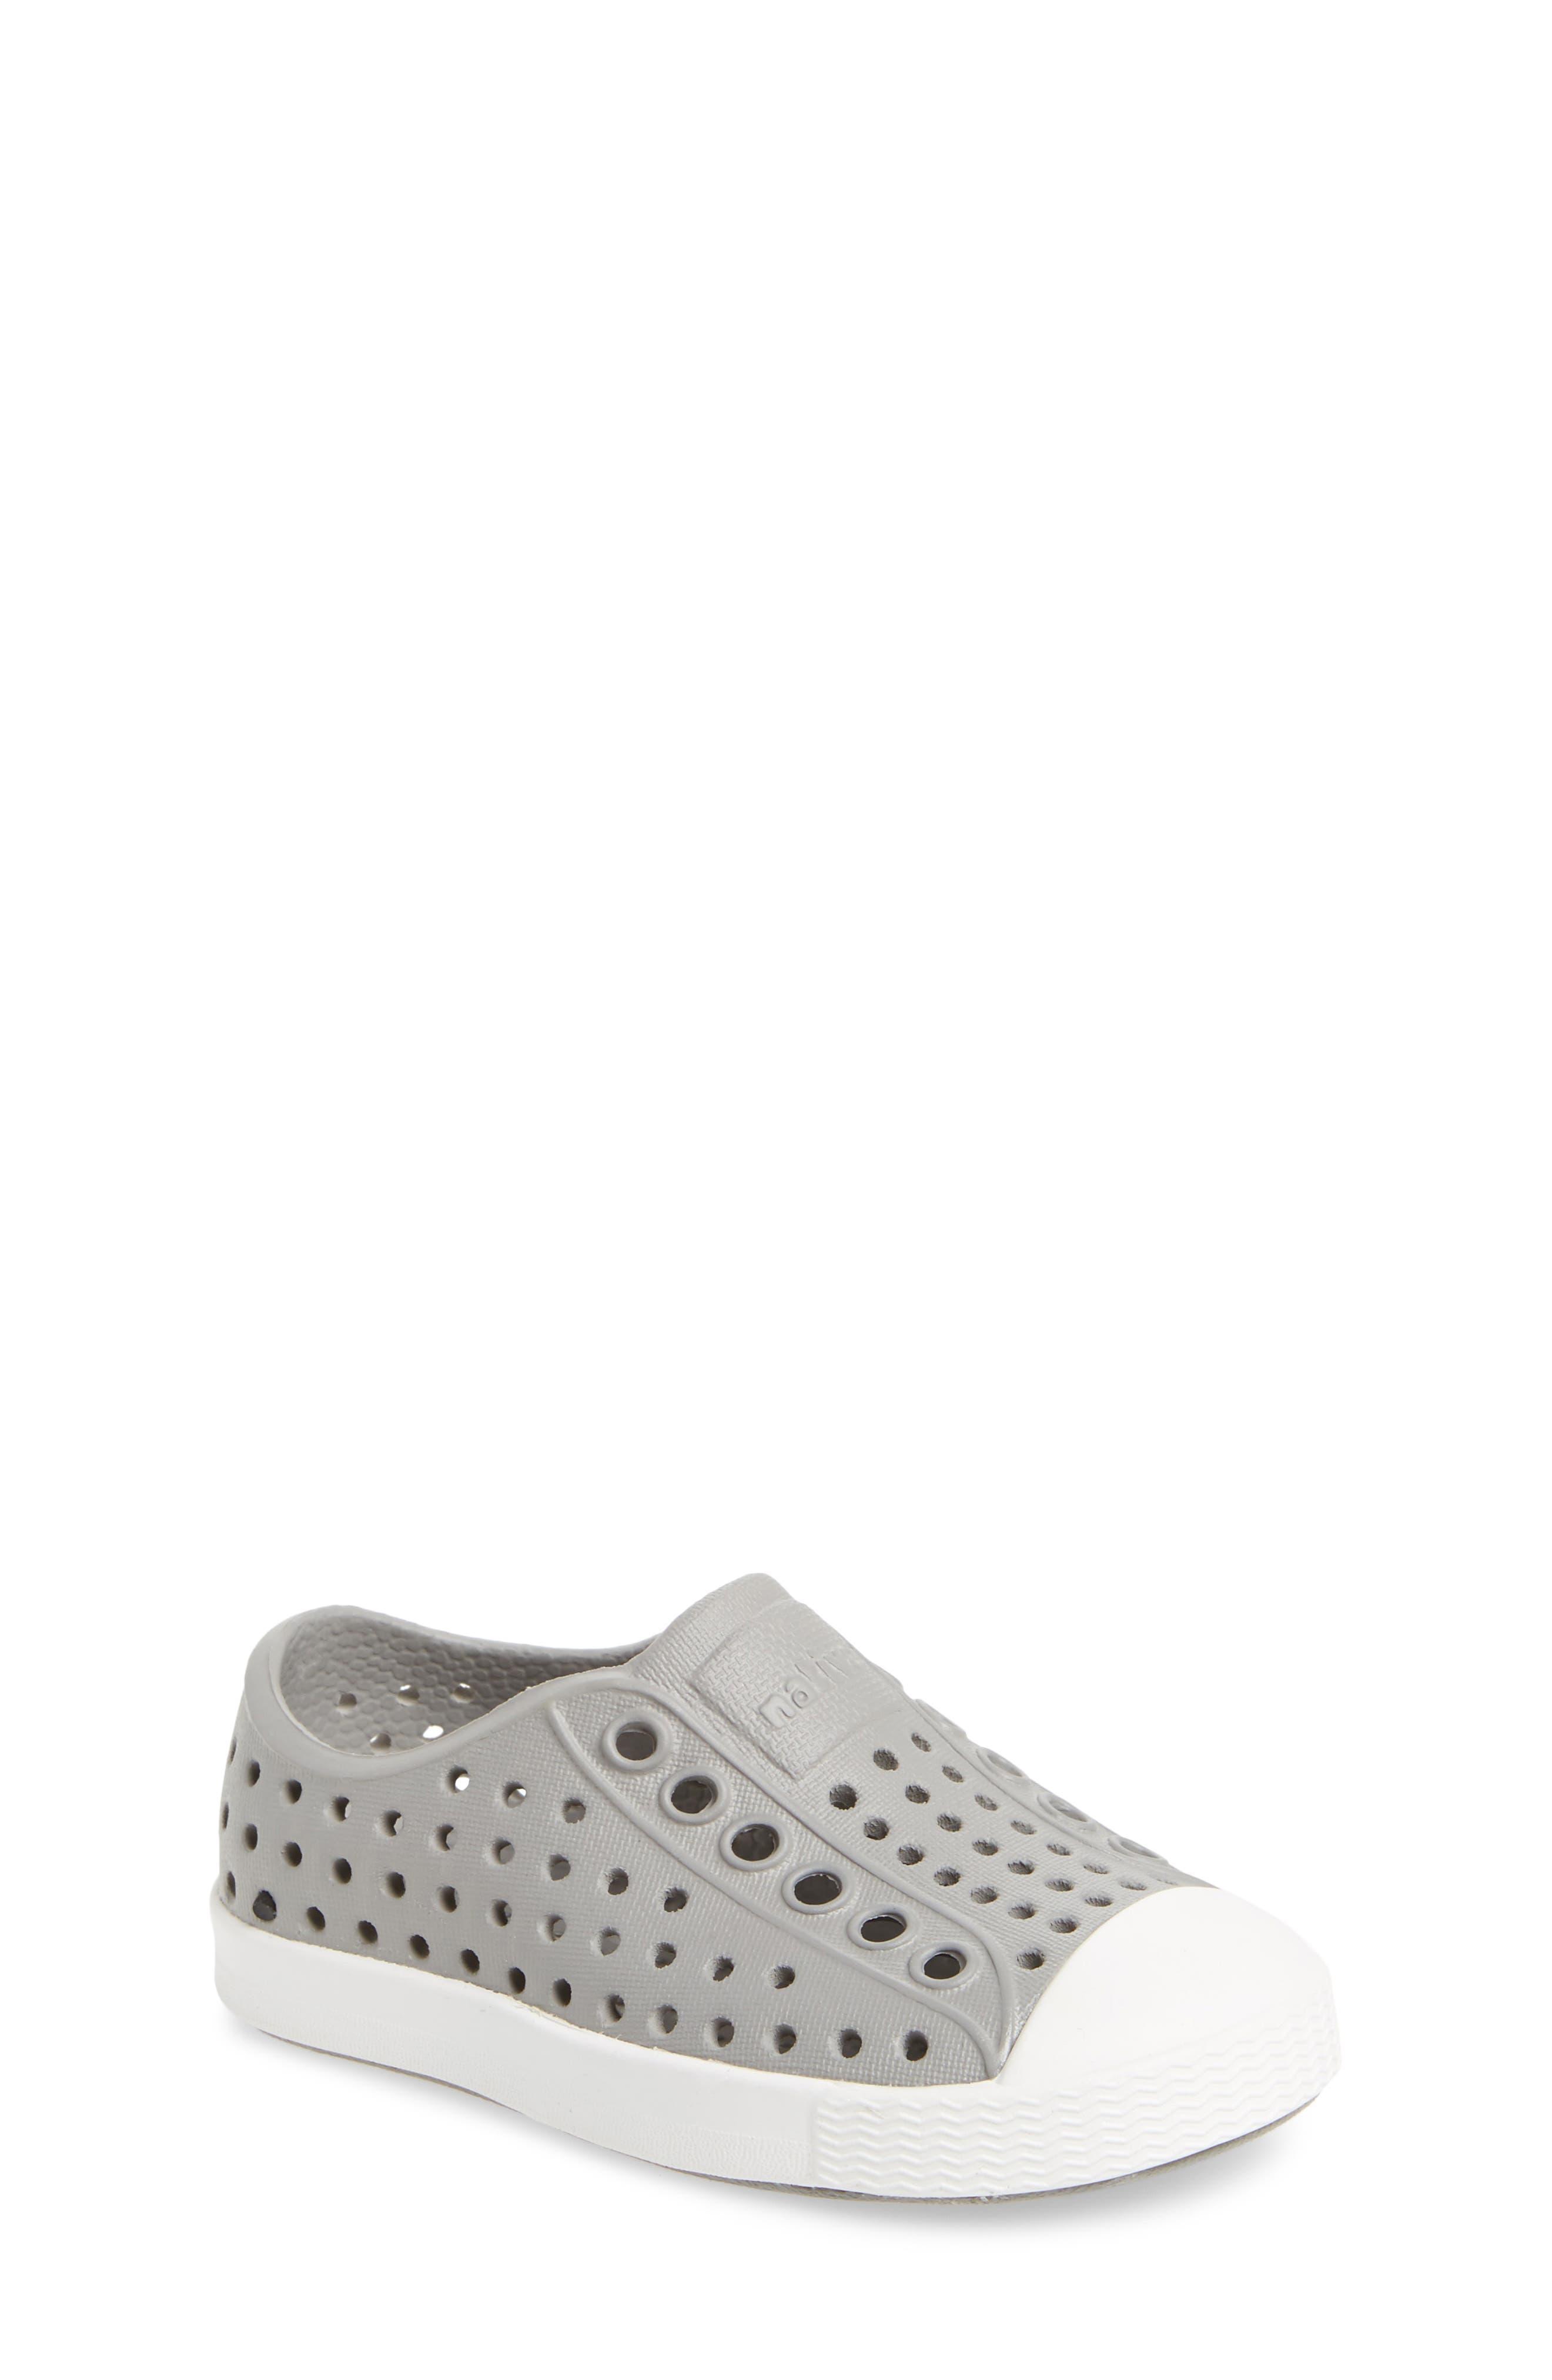 Alternate Image 1 Selected - Native Shoes 'Jefferson' Slip-On Sneaker (Baby, Walker, Toddler, Little Kid & Big Kid)